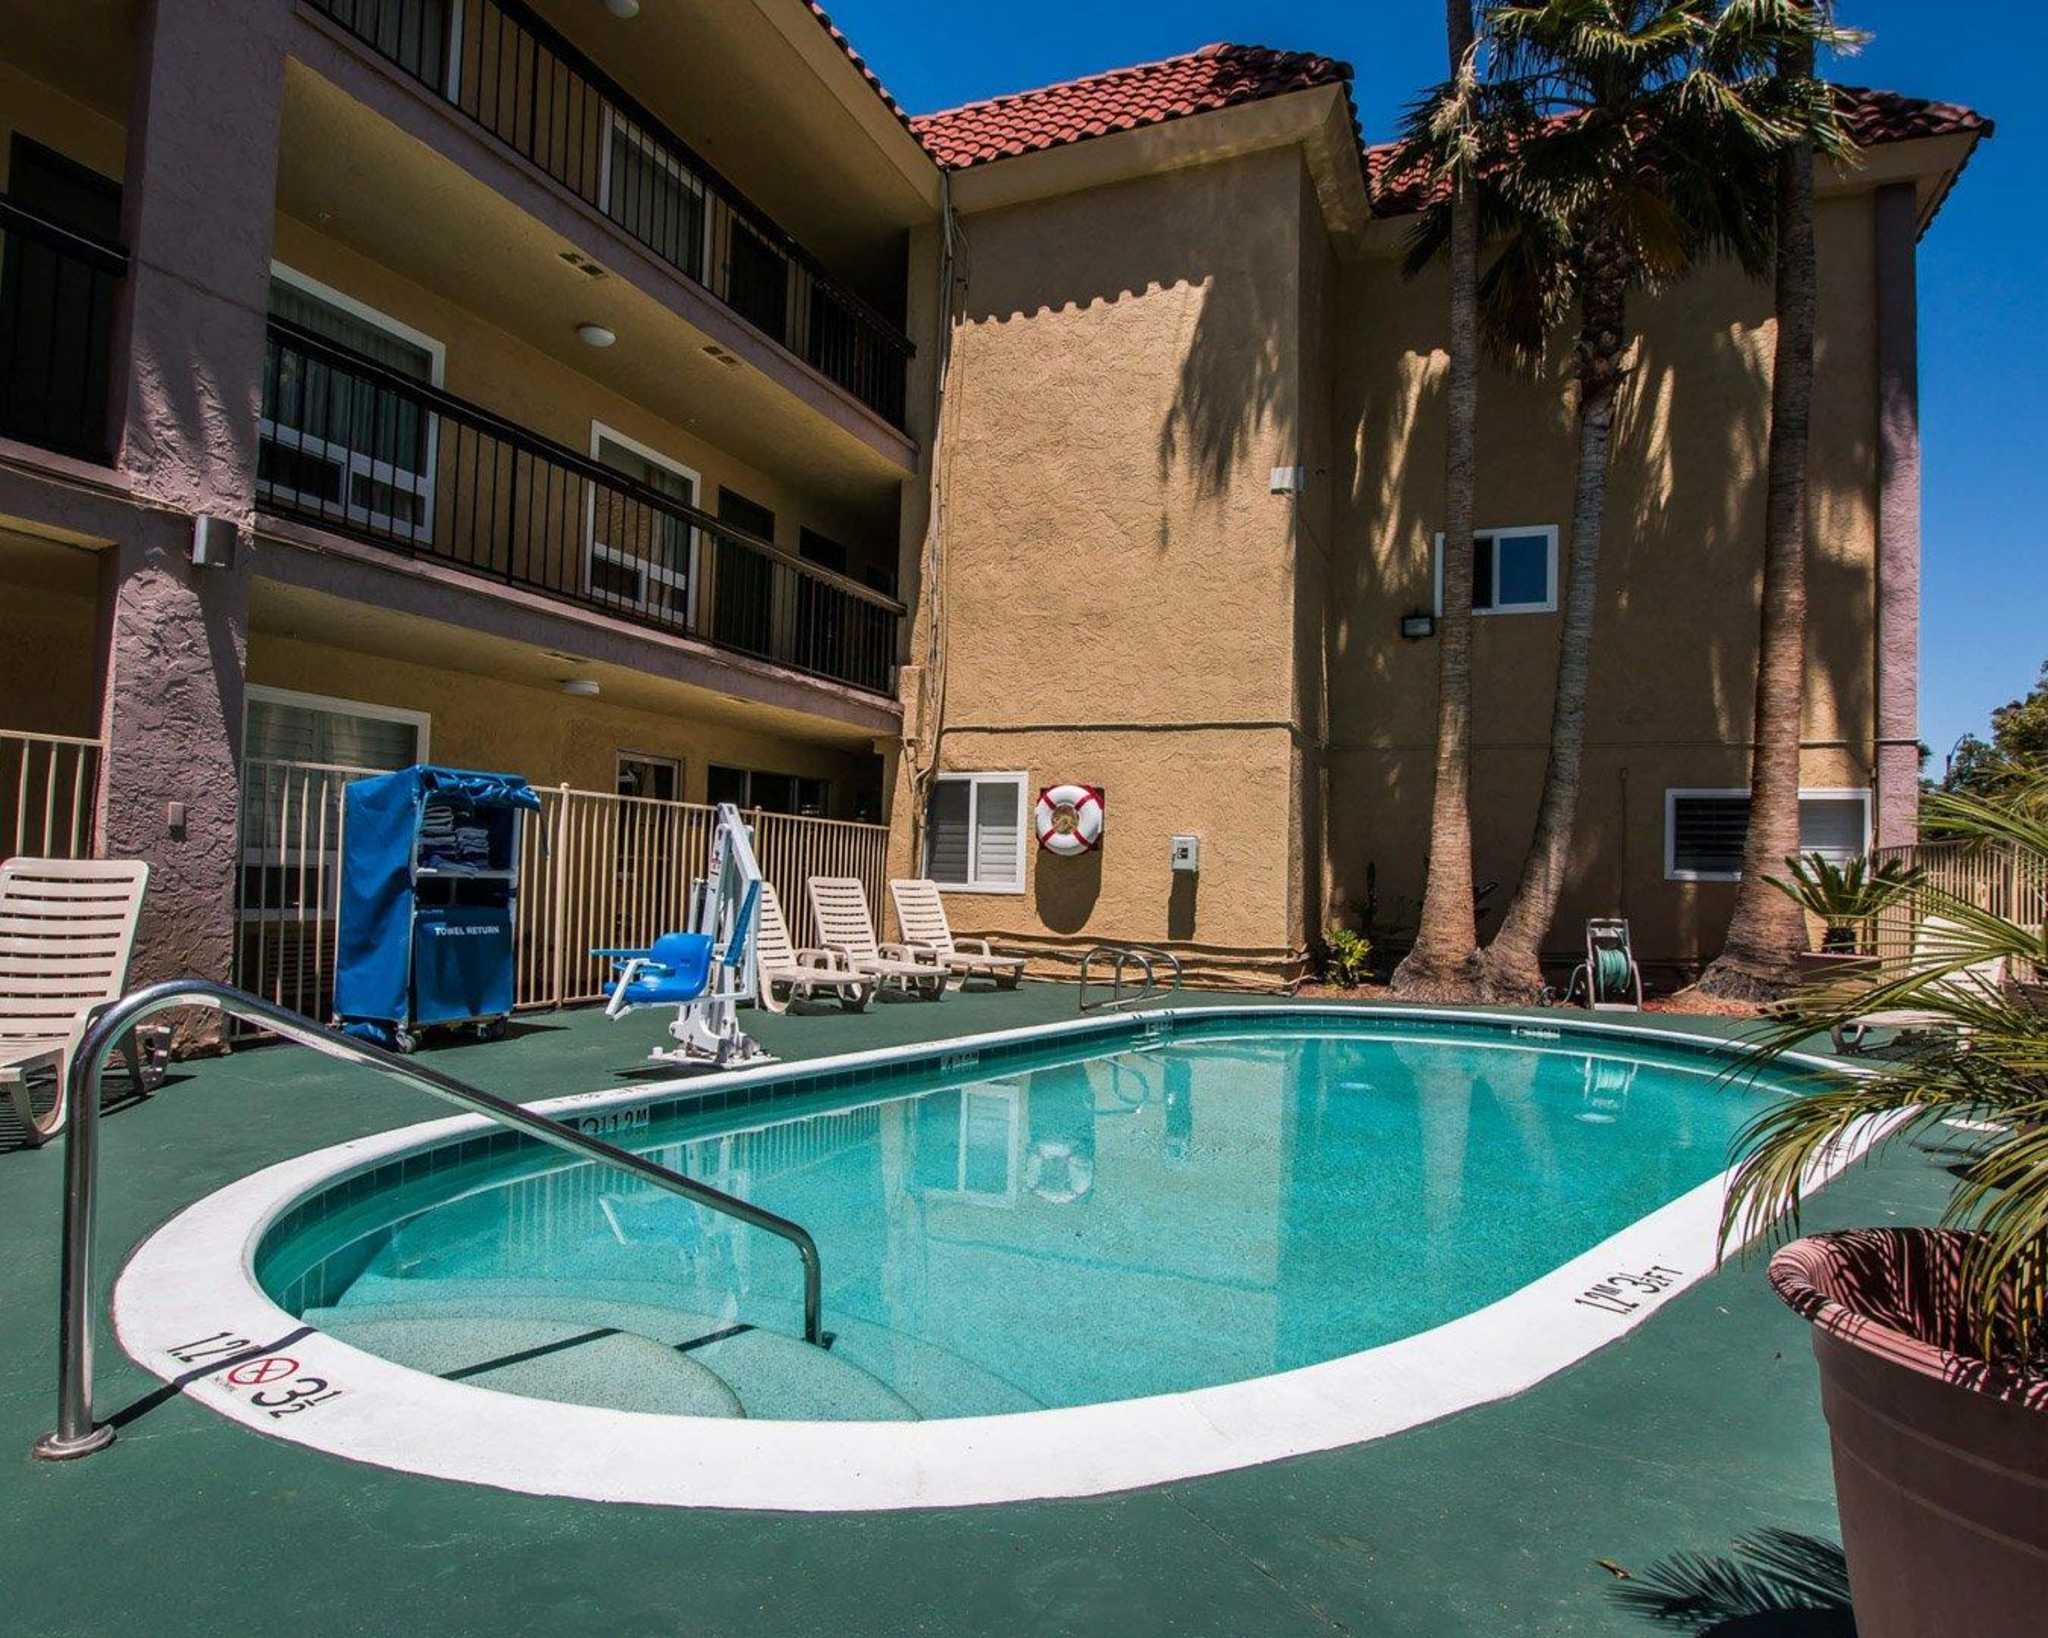 Encinitas Ca Hotels Motels